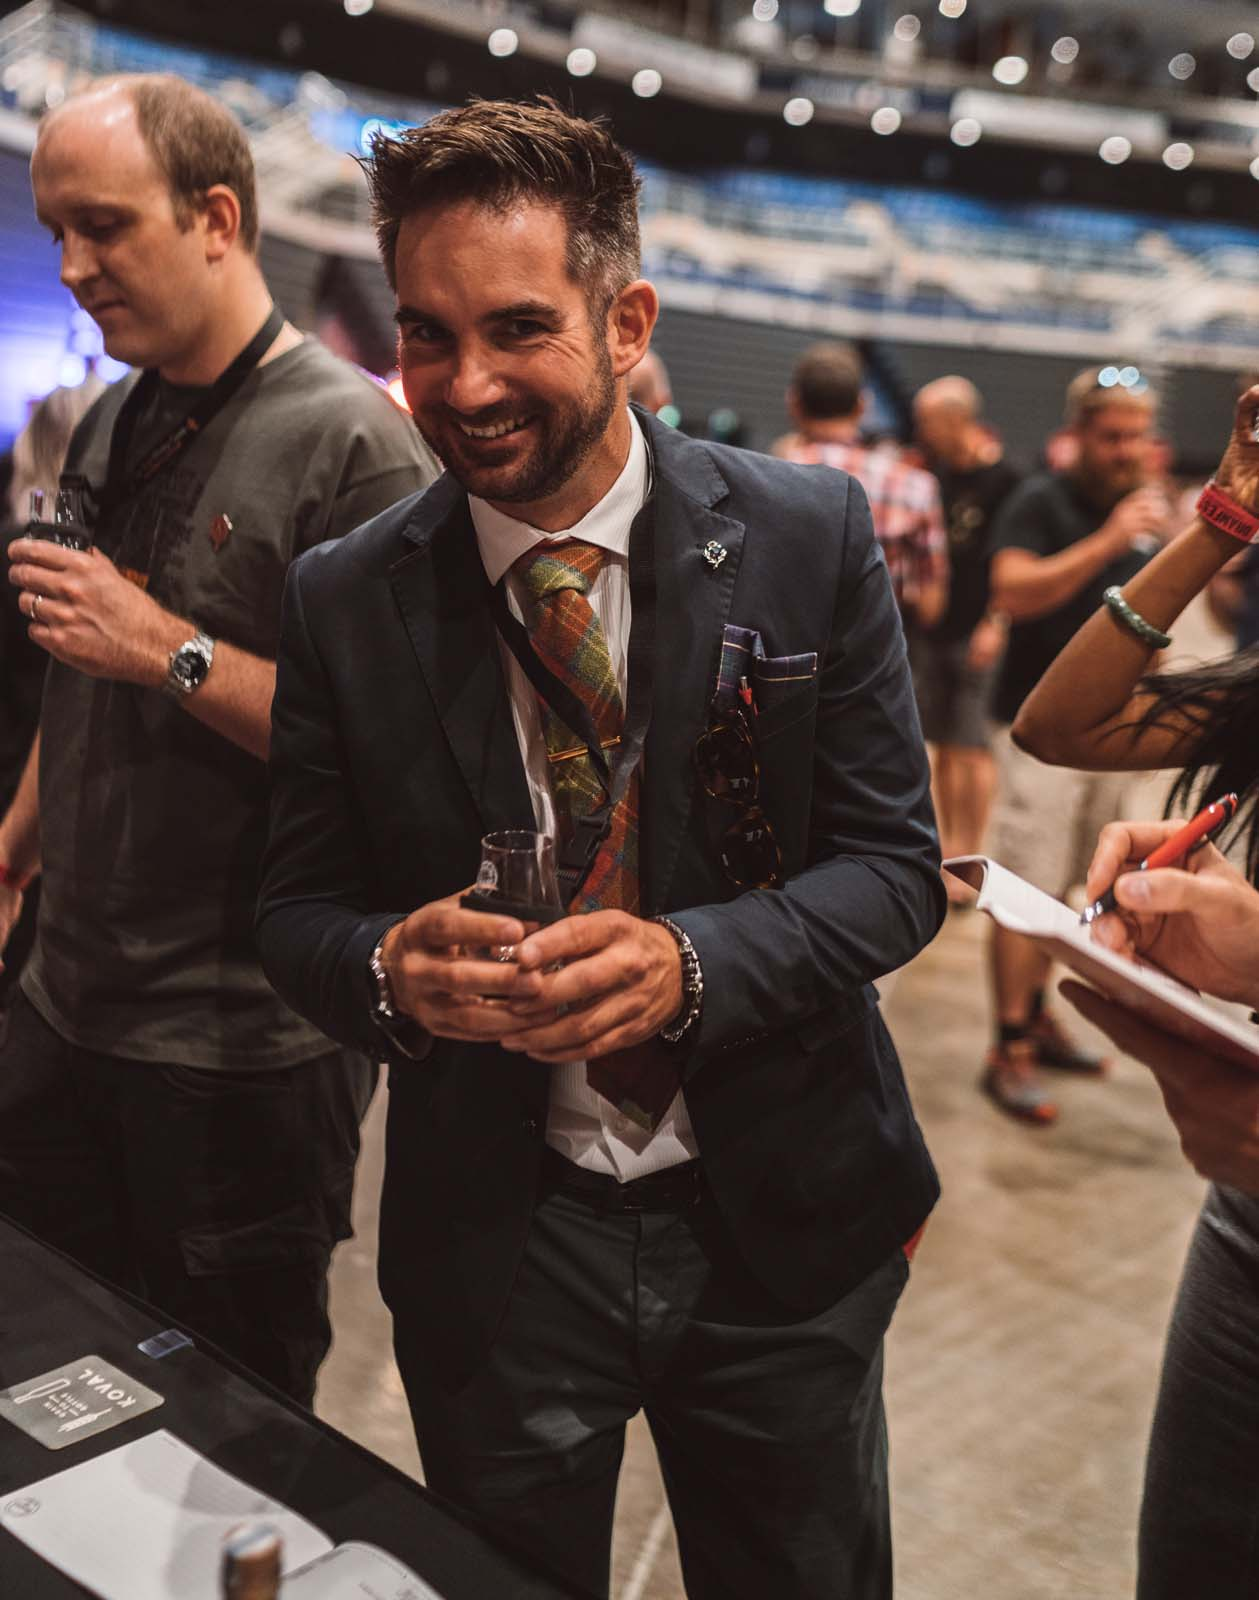 Dramfest 2018 for Whisky Galore-423.jpg